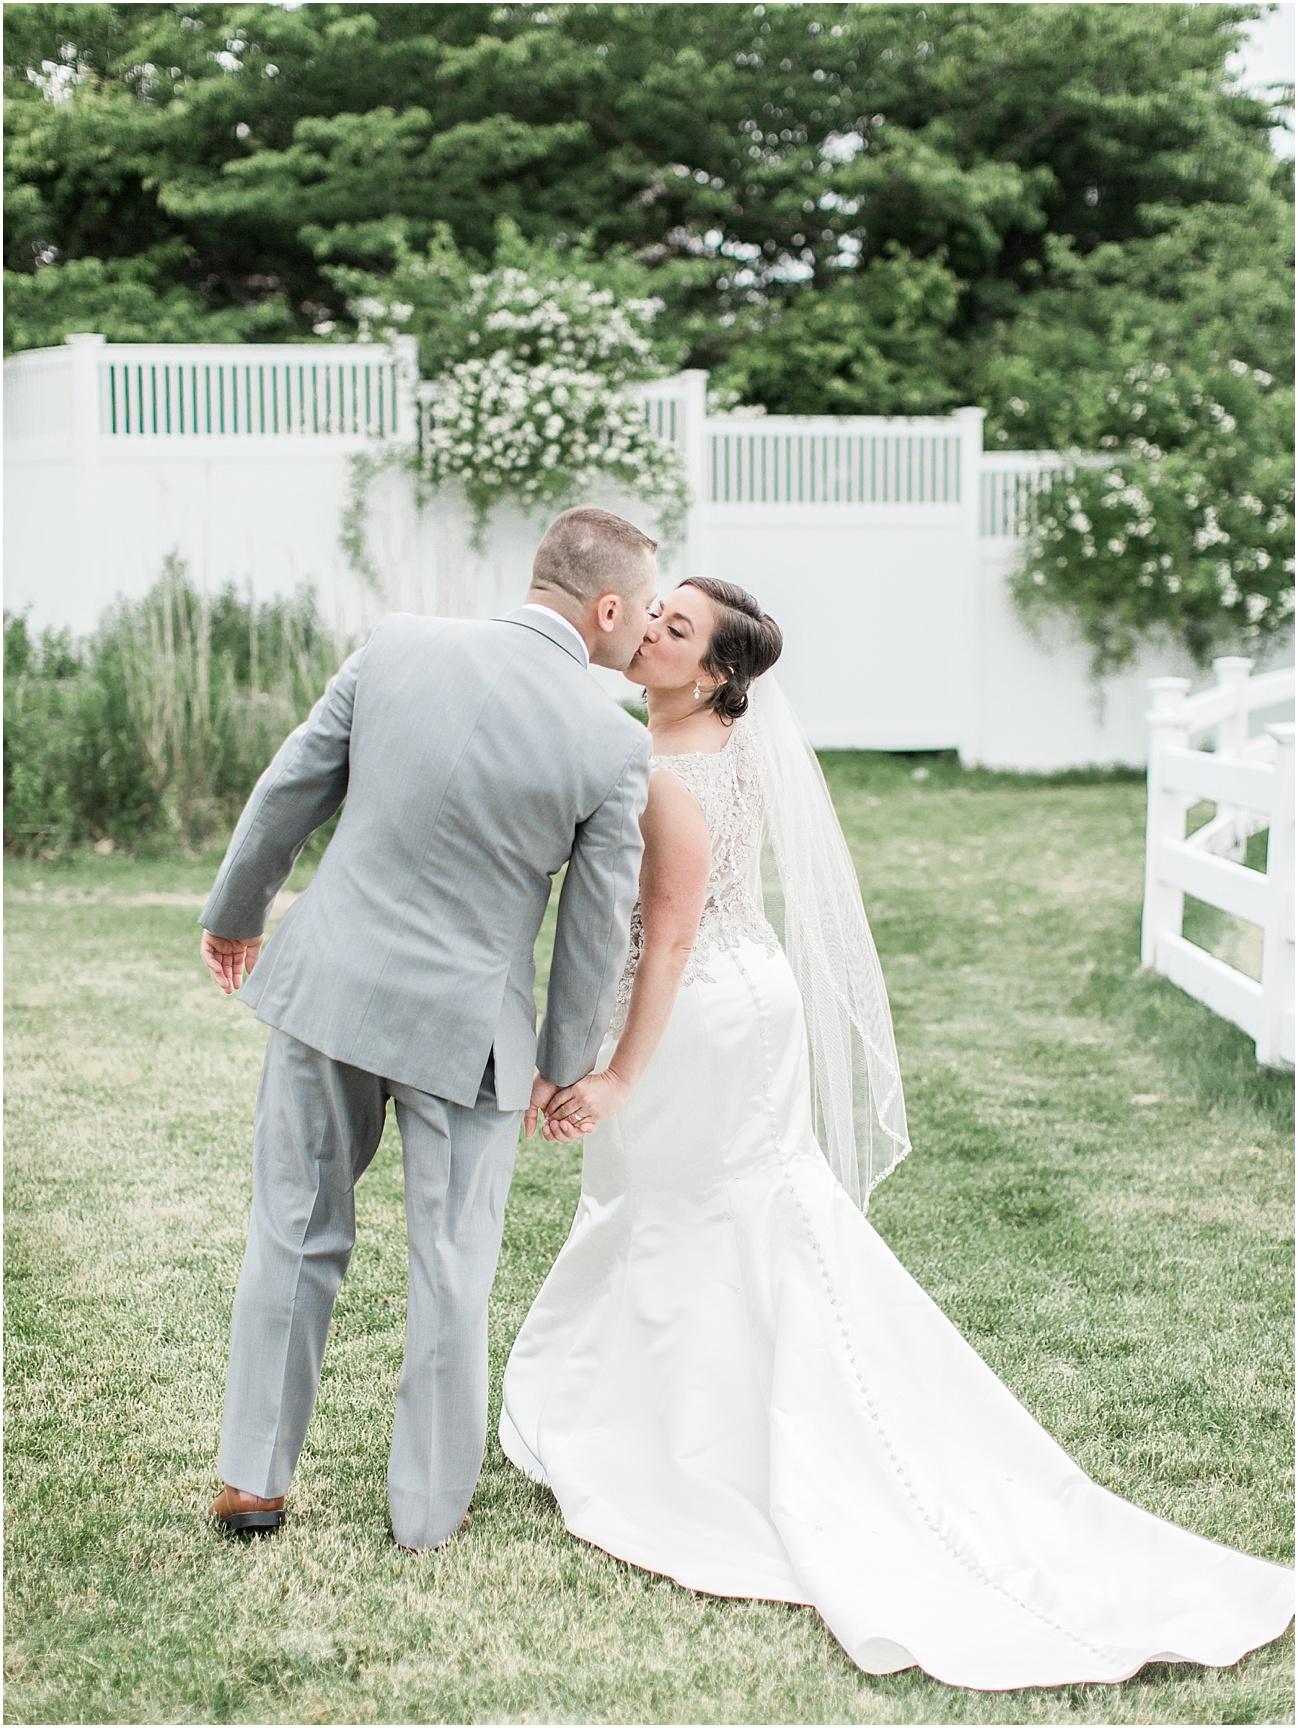 nicole_stephen_cape_club_nicky_falmouth_cod_boston_wedding_photographer_meredith_jane_photography_photo_0178.jpg